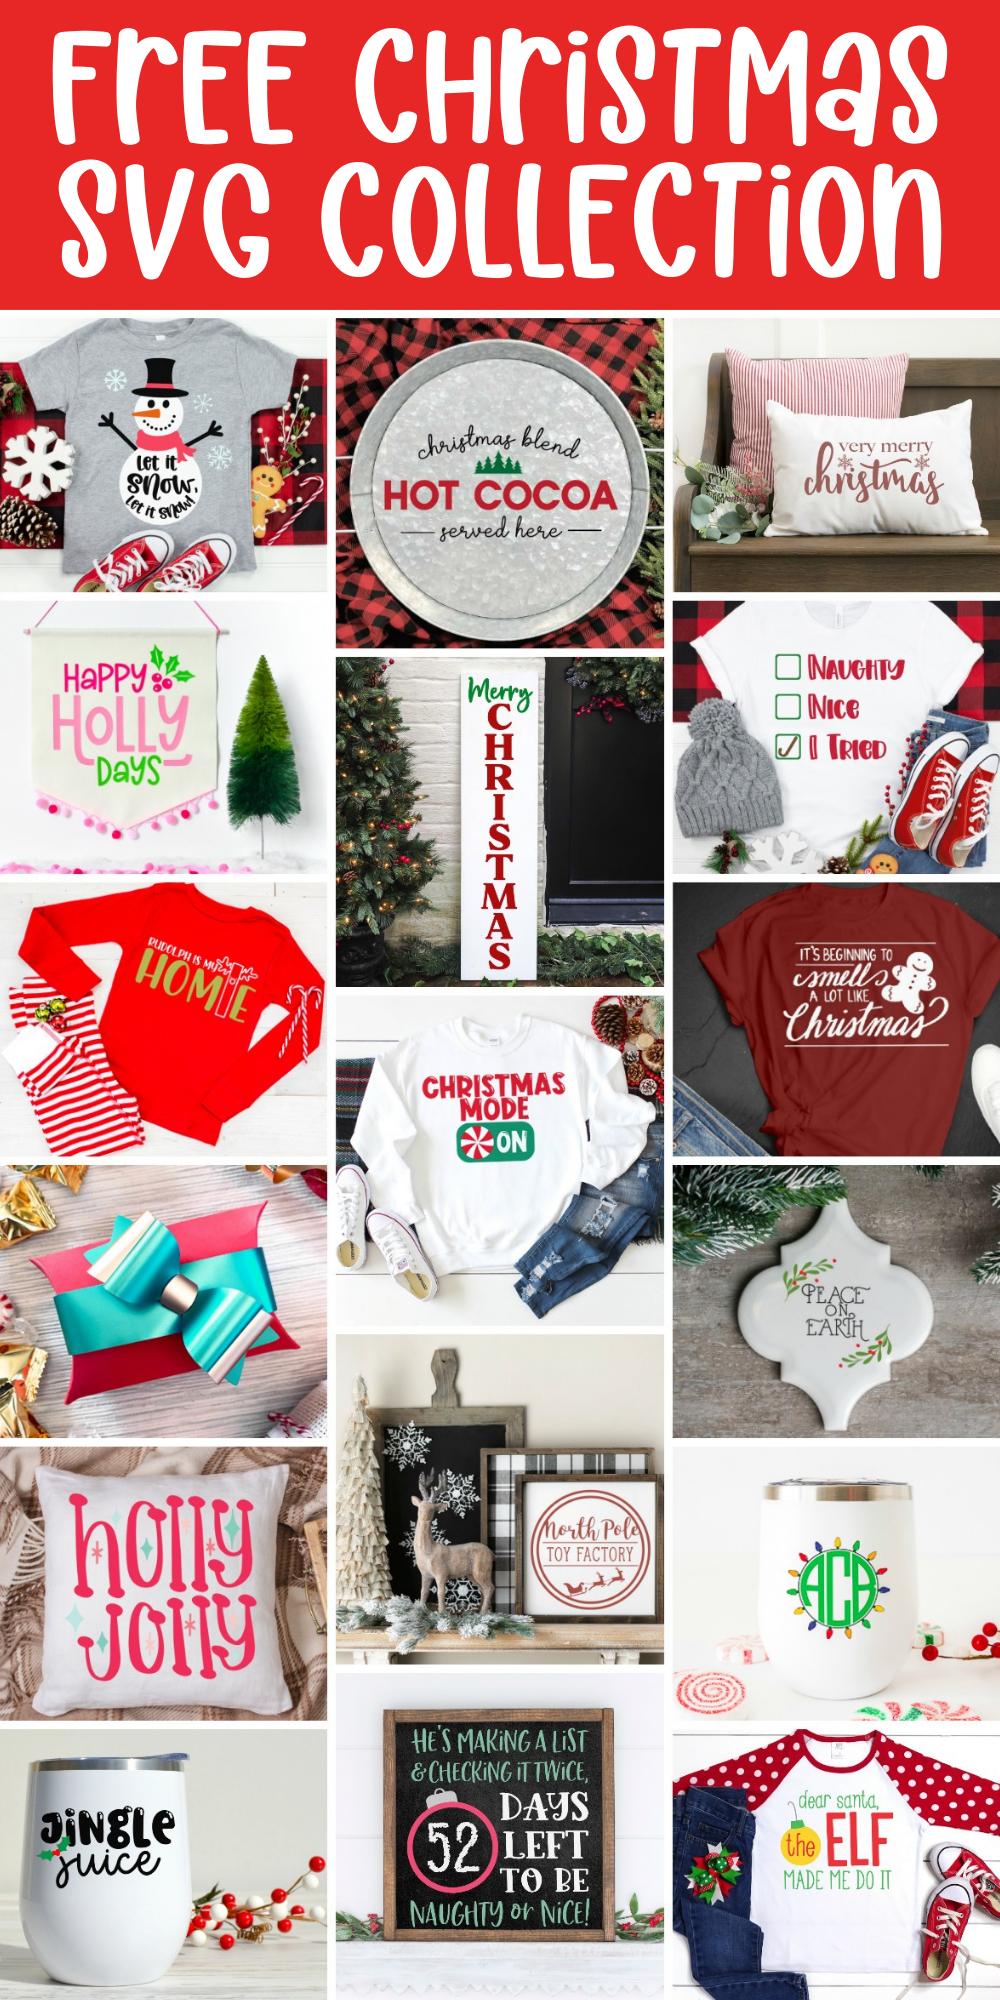 Free Christmas SVG Collection